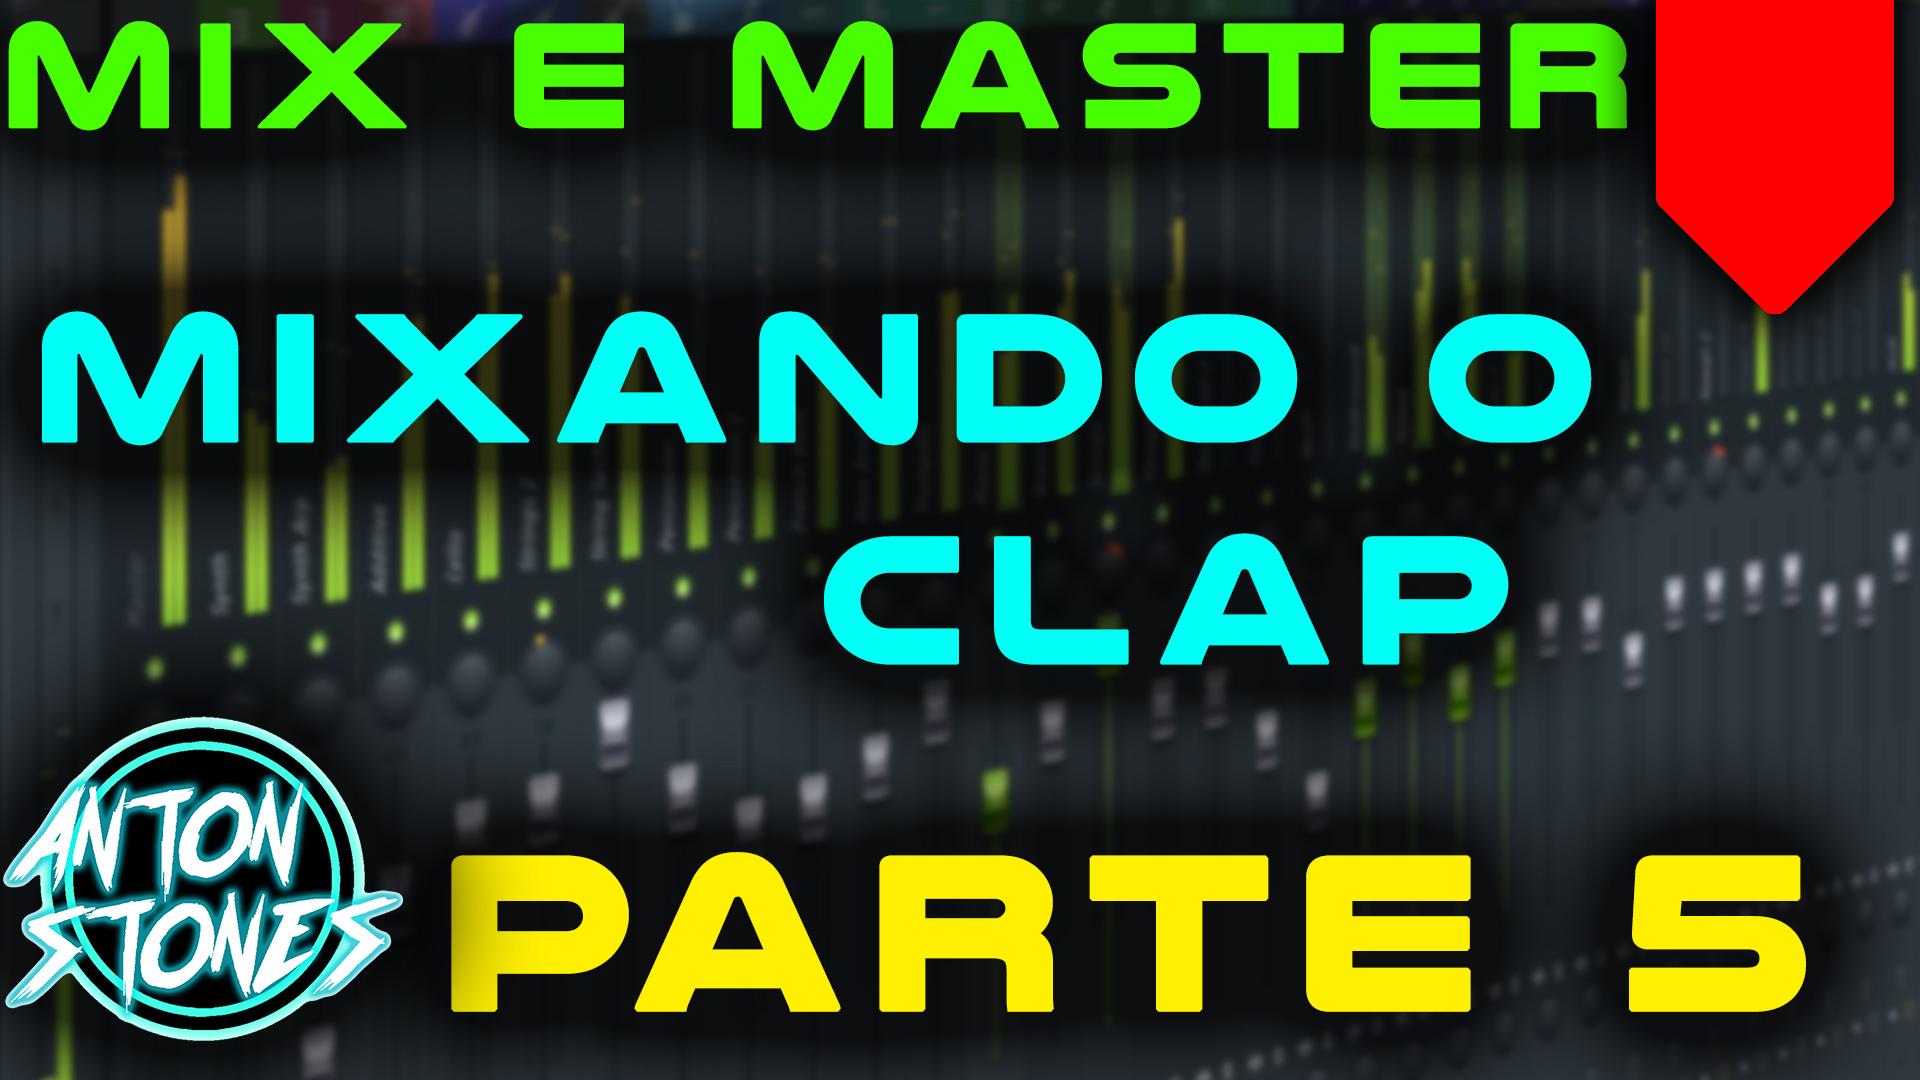 mix e master 5.jpg